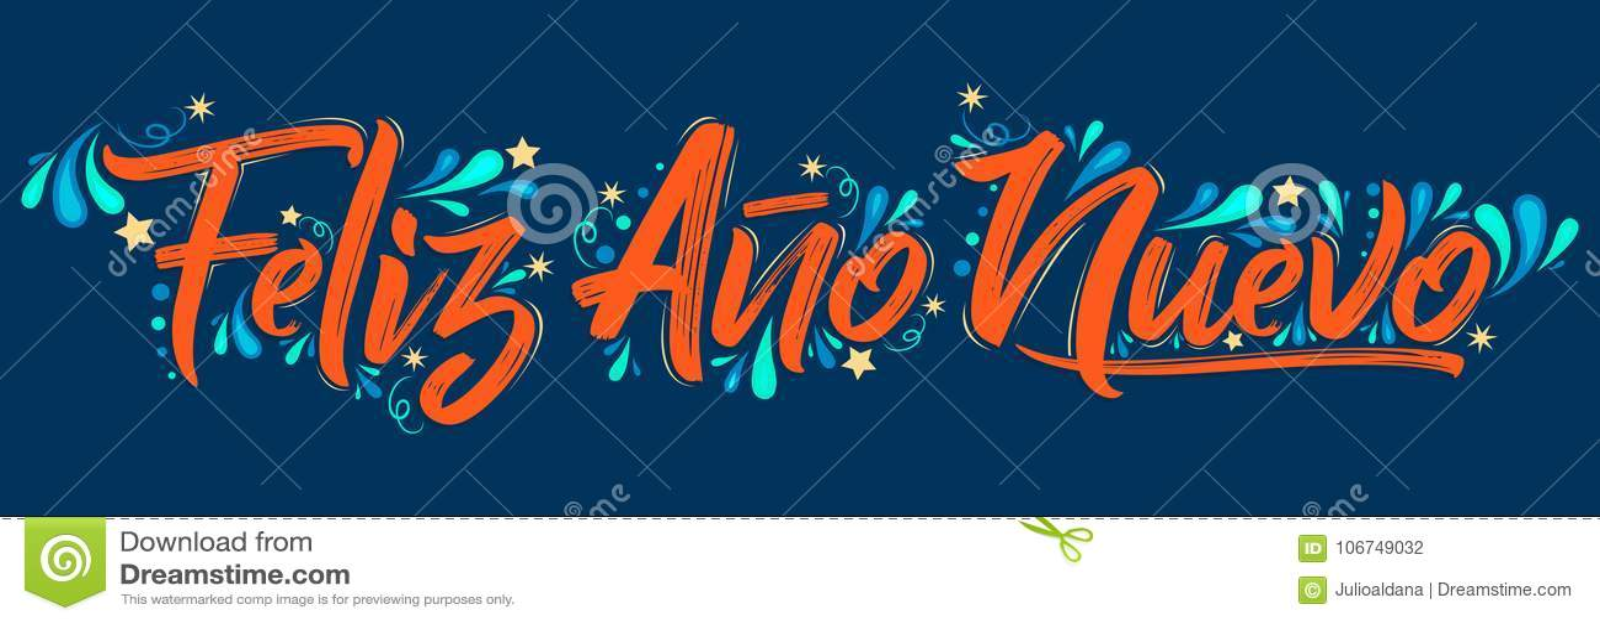 Feliz Ano Nuevo, Happy New Year Spanish Text Holiday Lettering ...